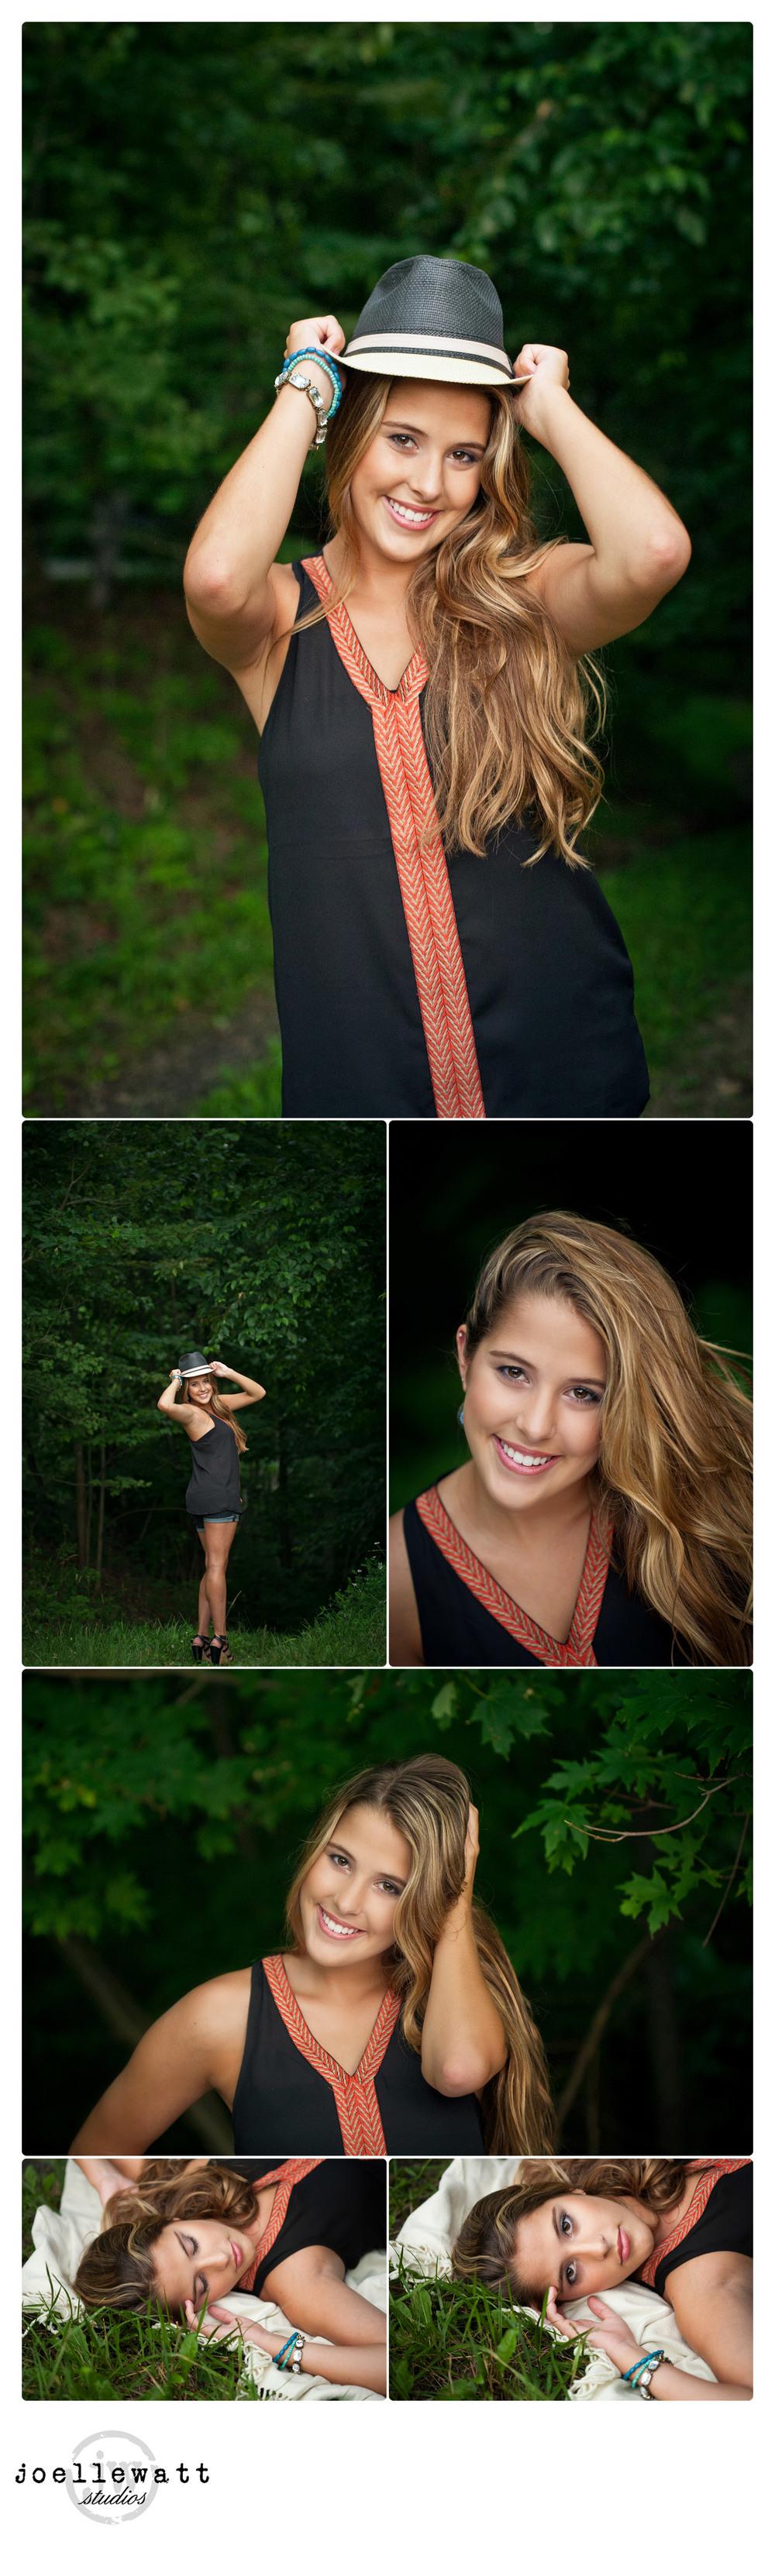 Blog-Collage-1375972439159.jpg